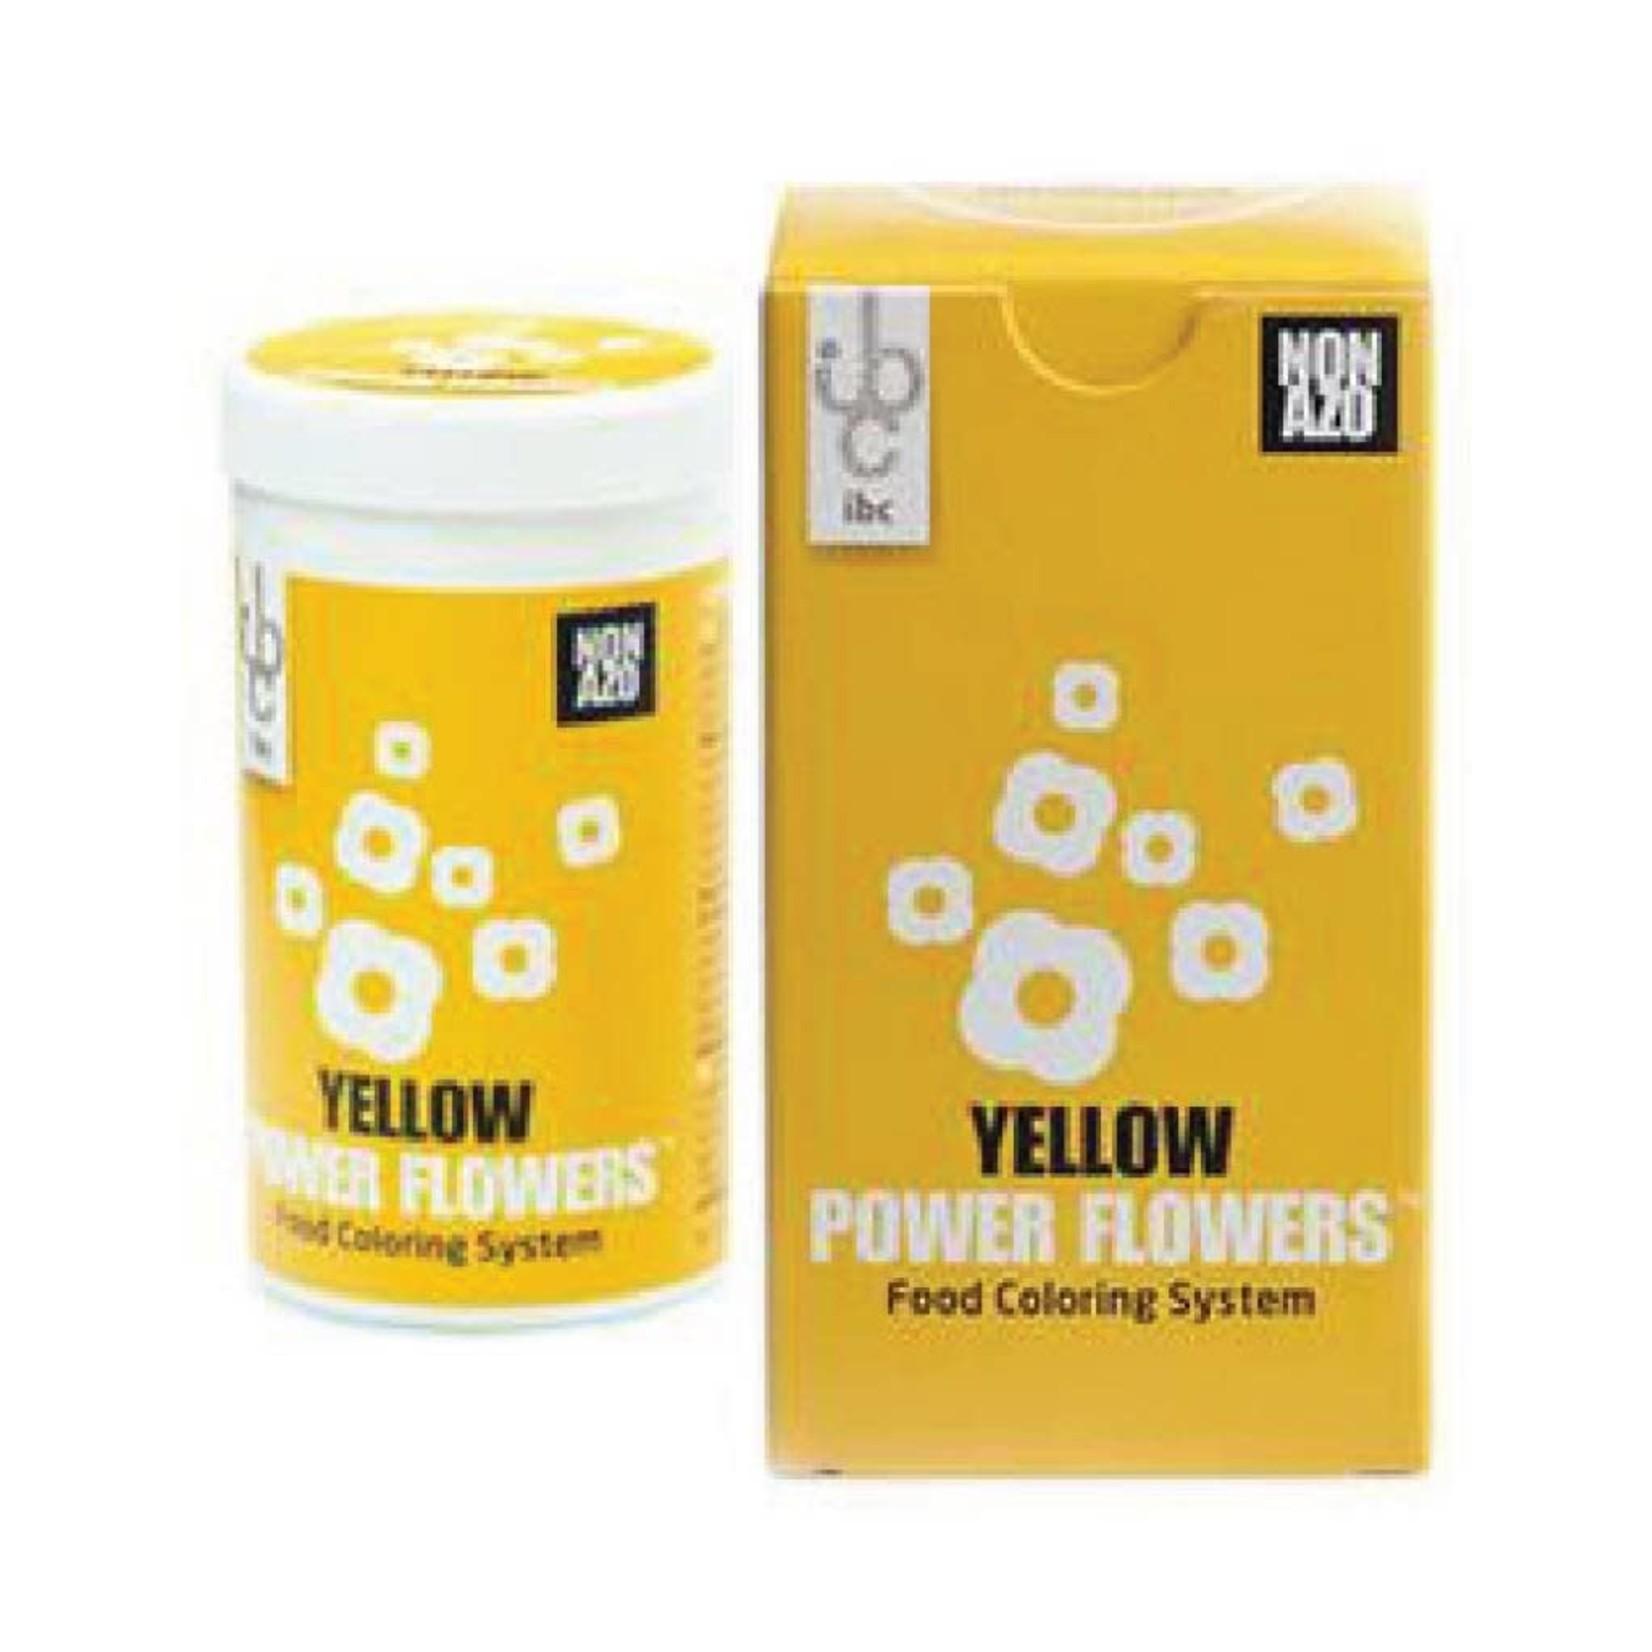 Mona Lisa IBC - Power Flowers, Yellow -50g, CLR-19431-999 (box of 4)